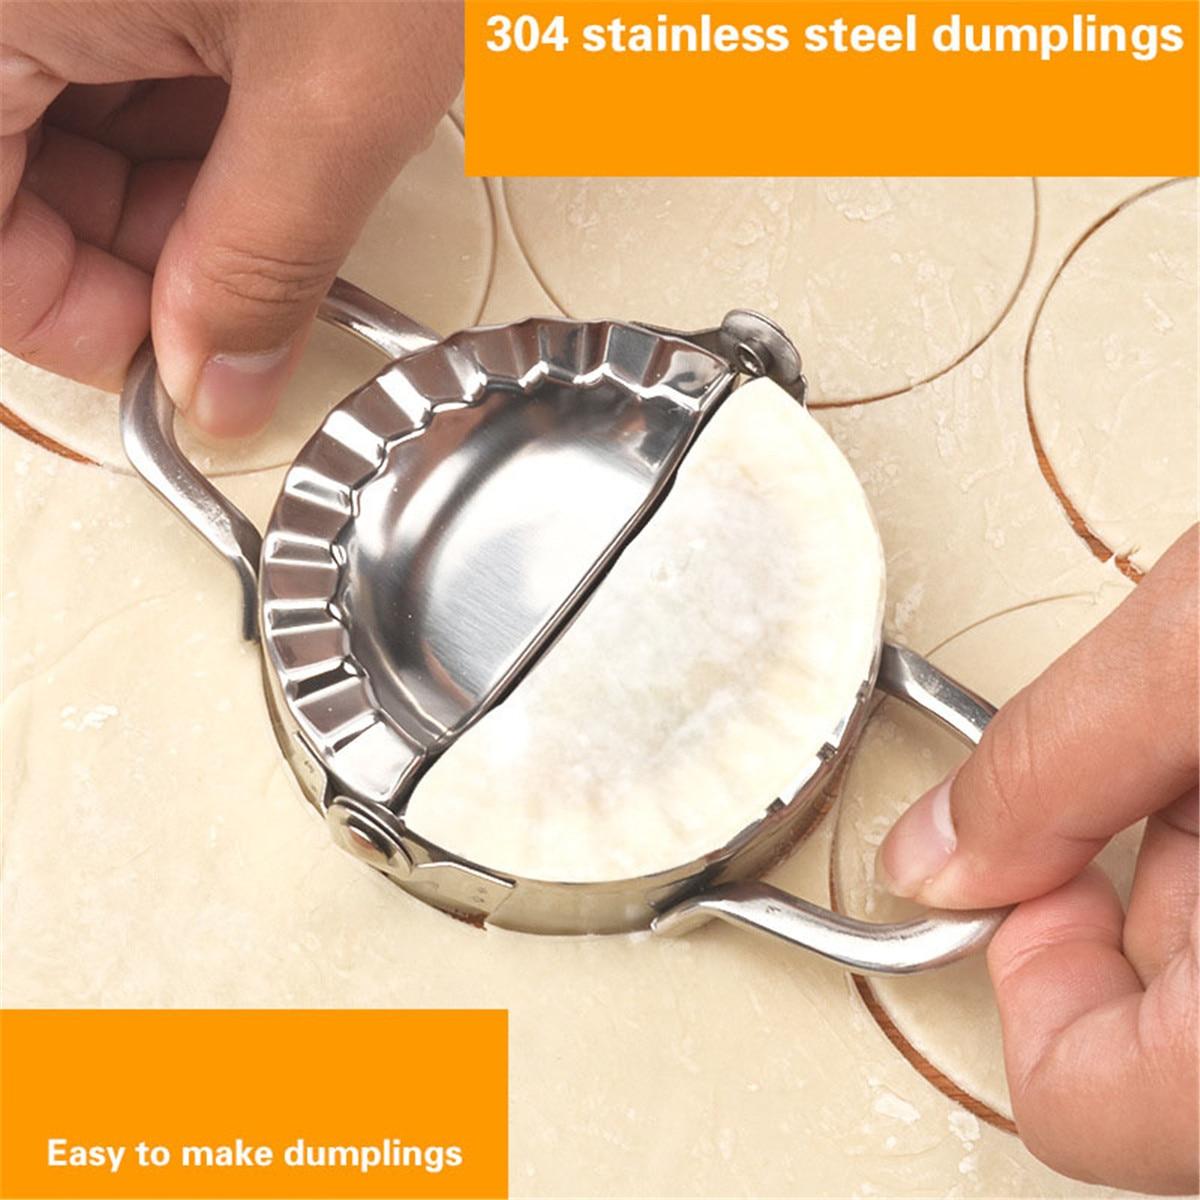 Dispositivo de fabricante de Dumpling Jiaozi, máquina para hacer moldes, utensilios de cocina DIY